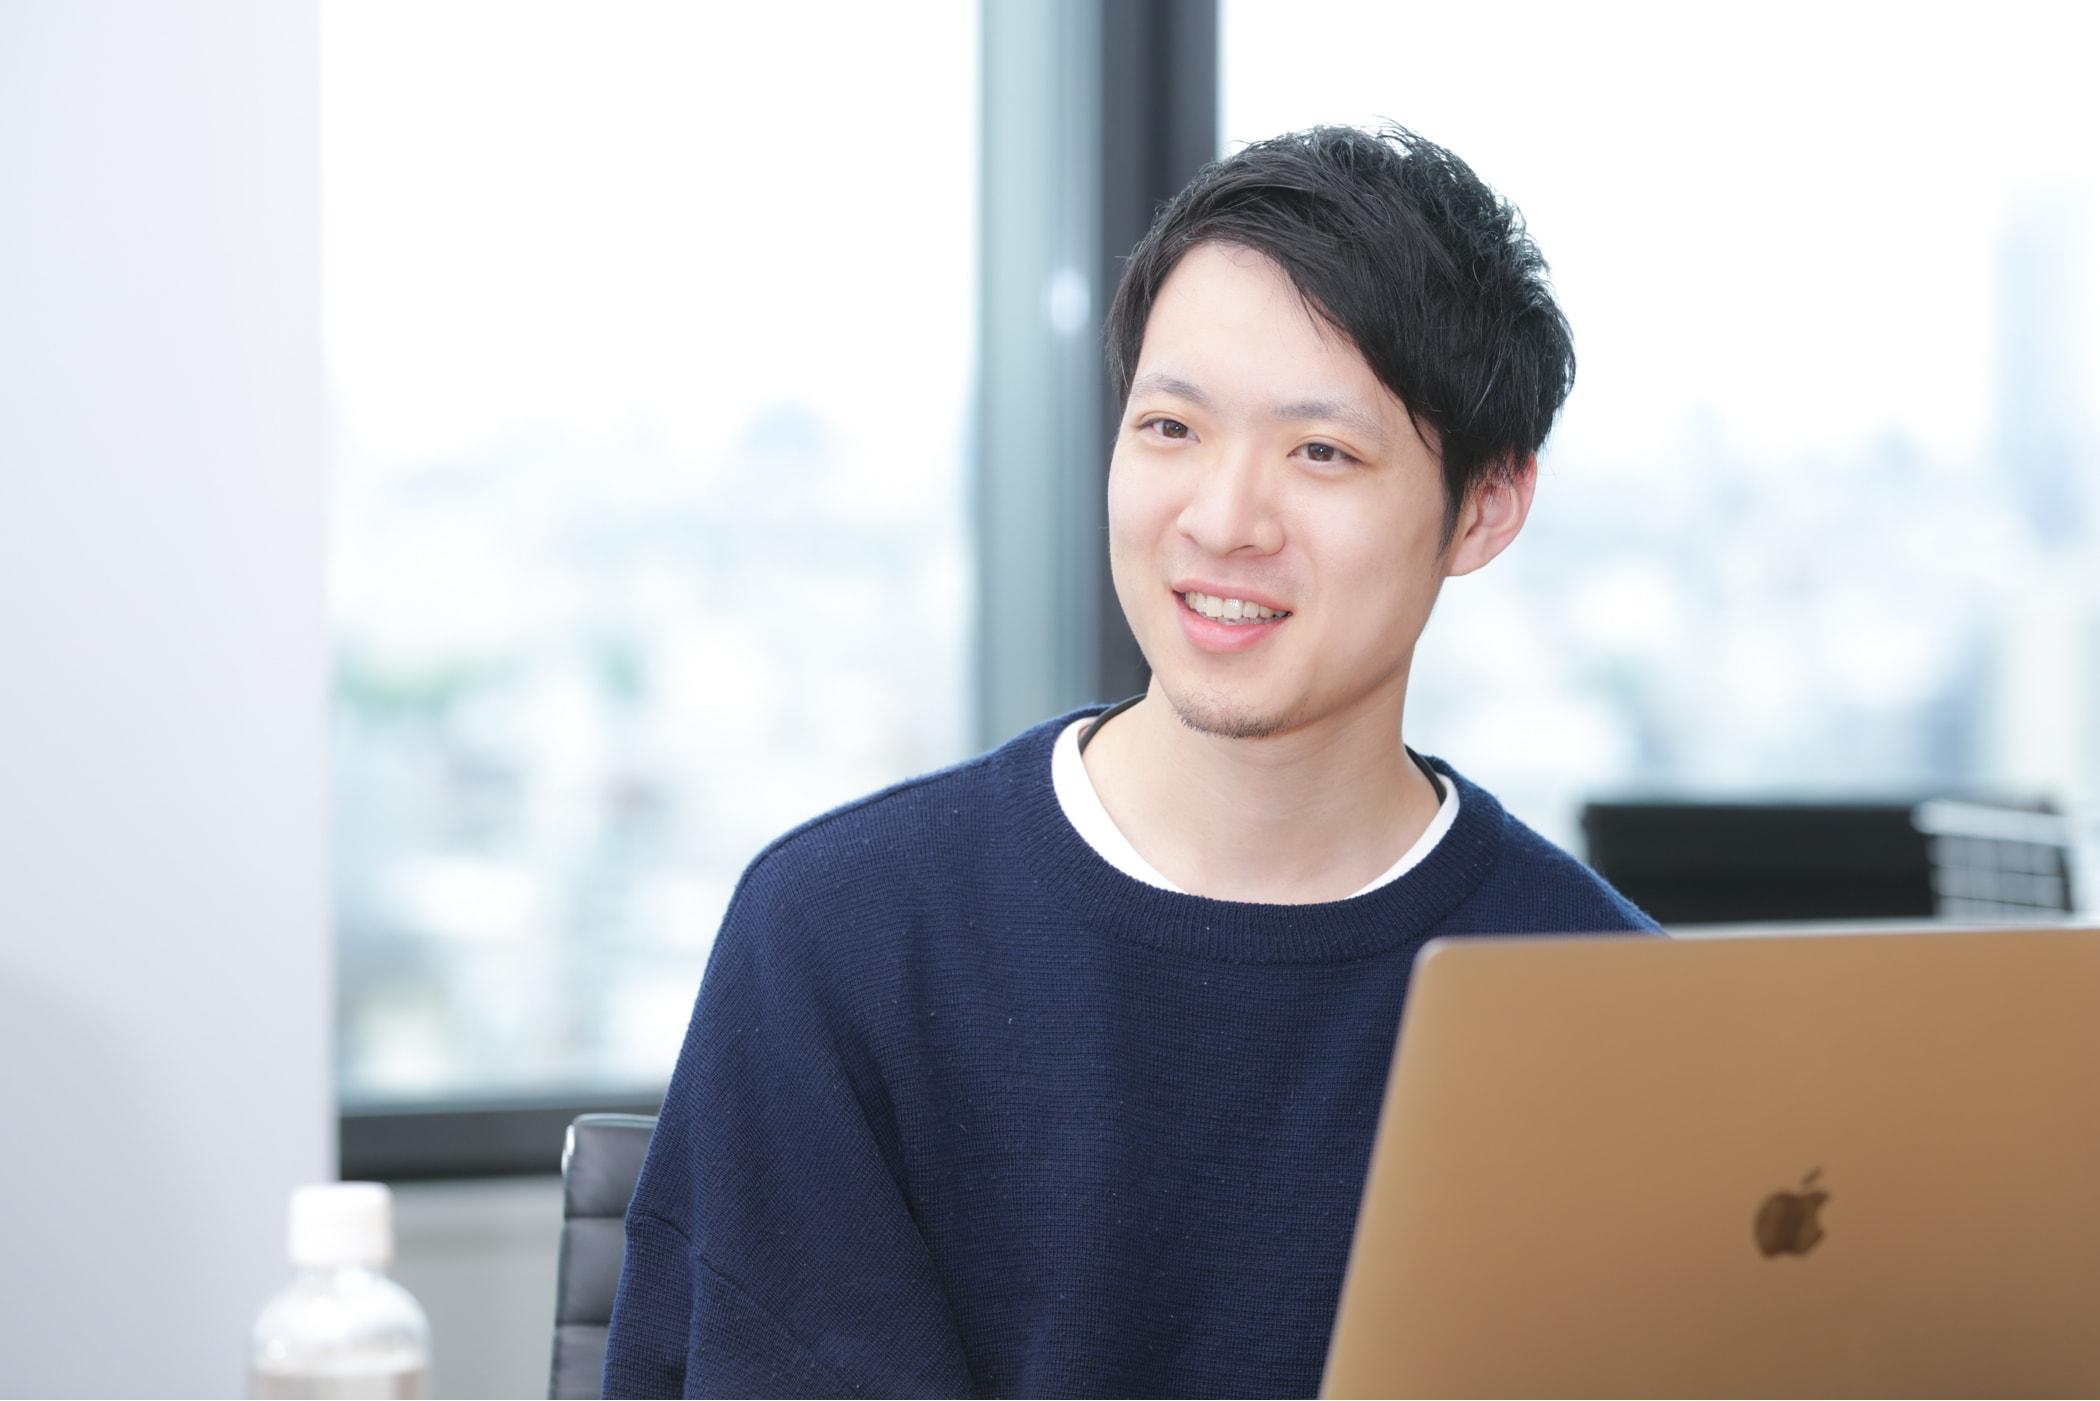 Mr. Yuta Nomura, Livedoor News Team, 2nd Media Division, LINE Portal Company